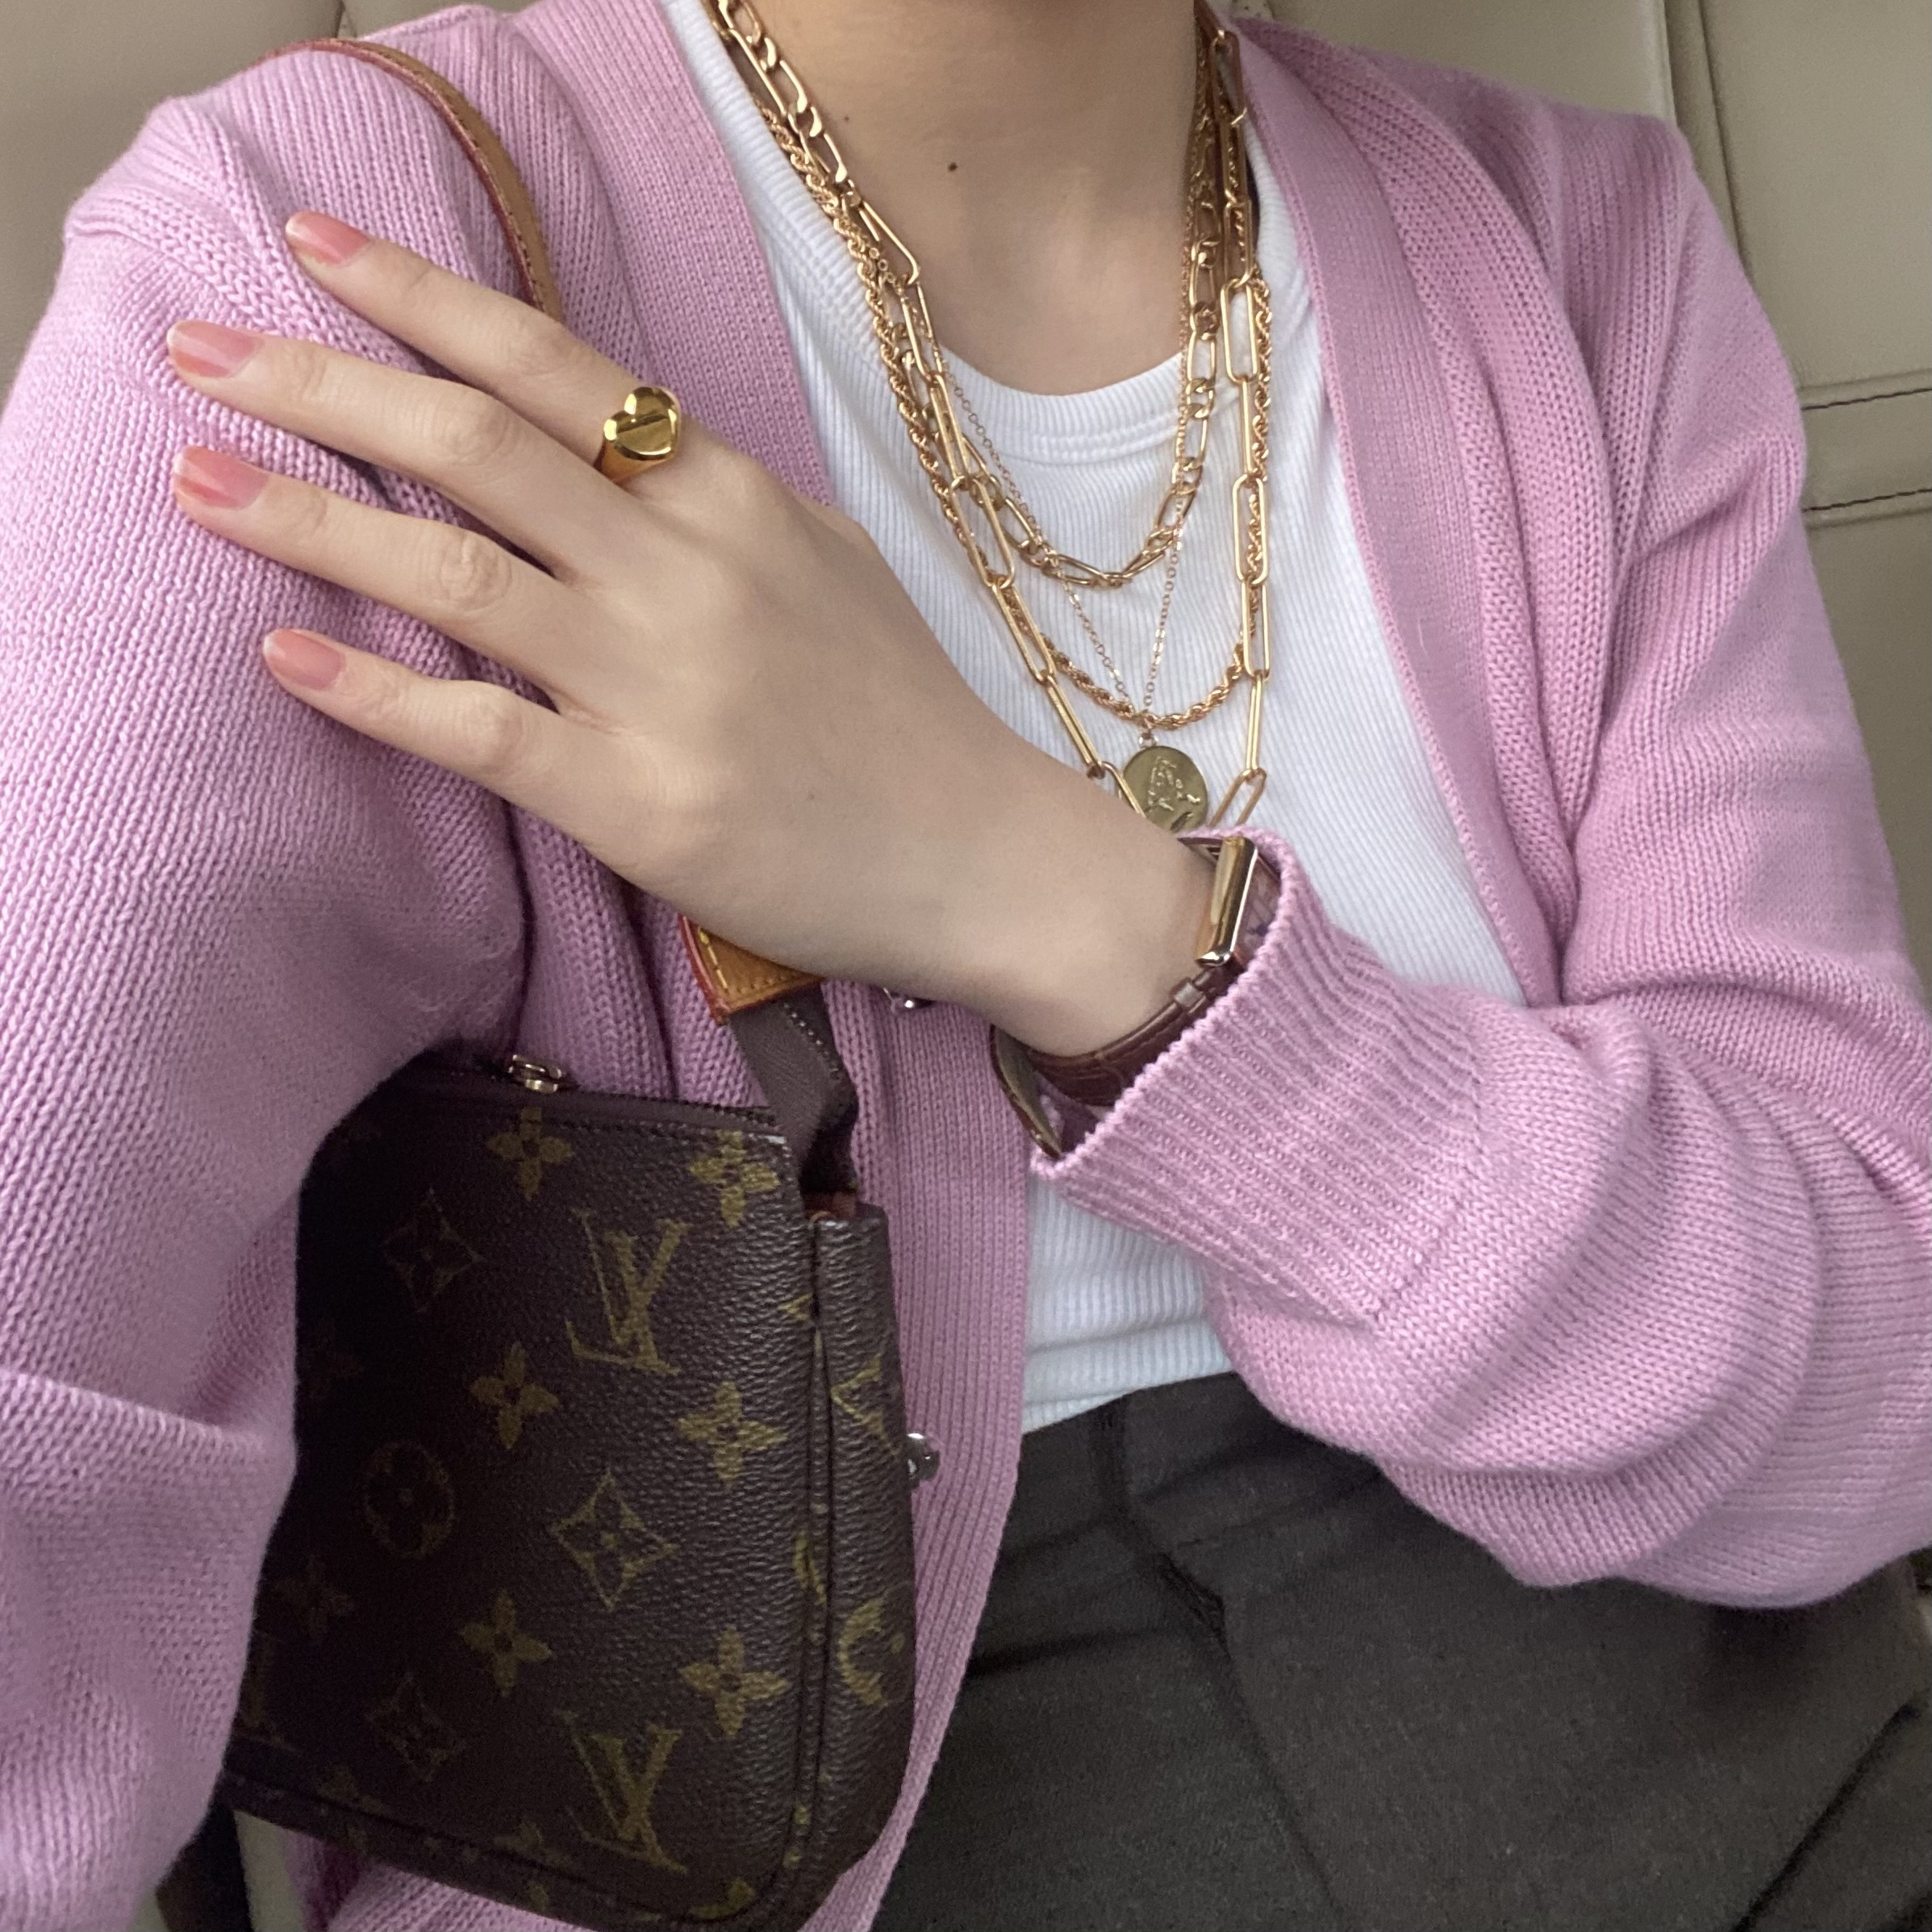 【LAST1】DAYNYC snap pink cardigan